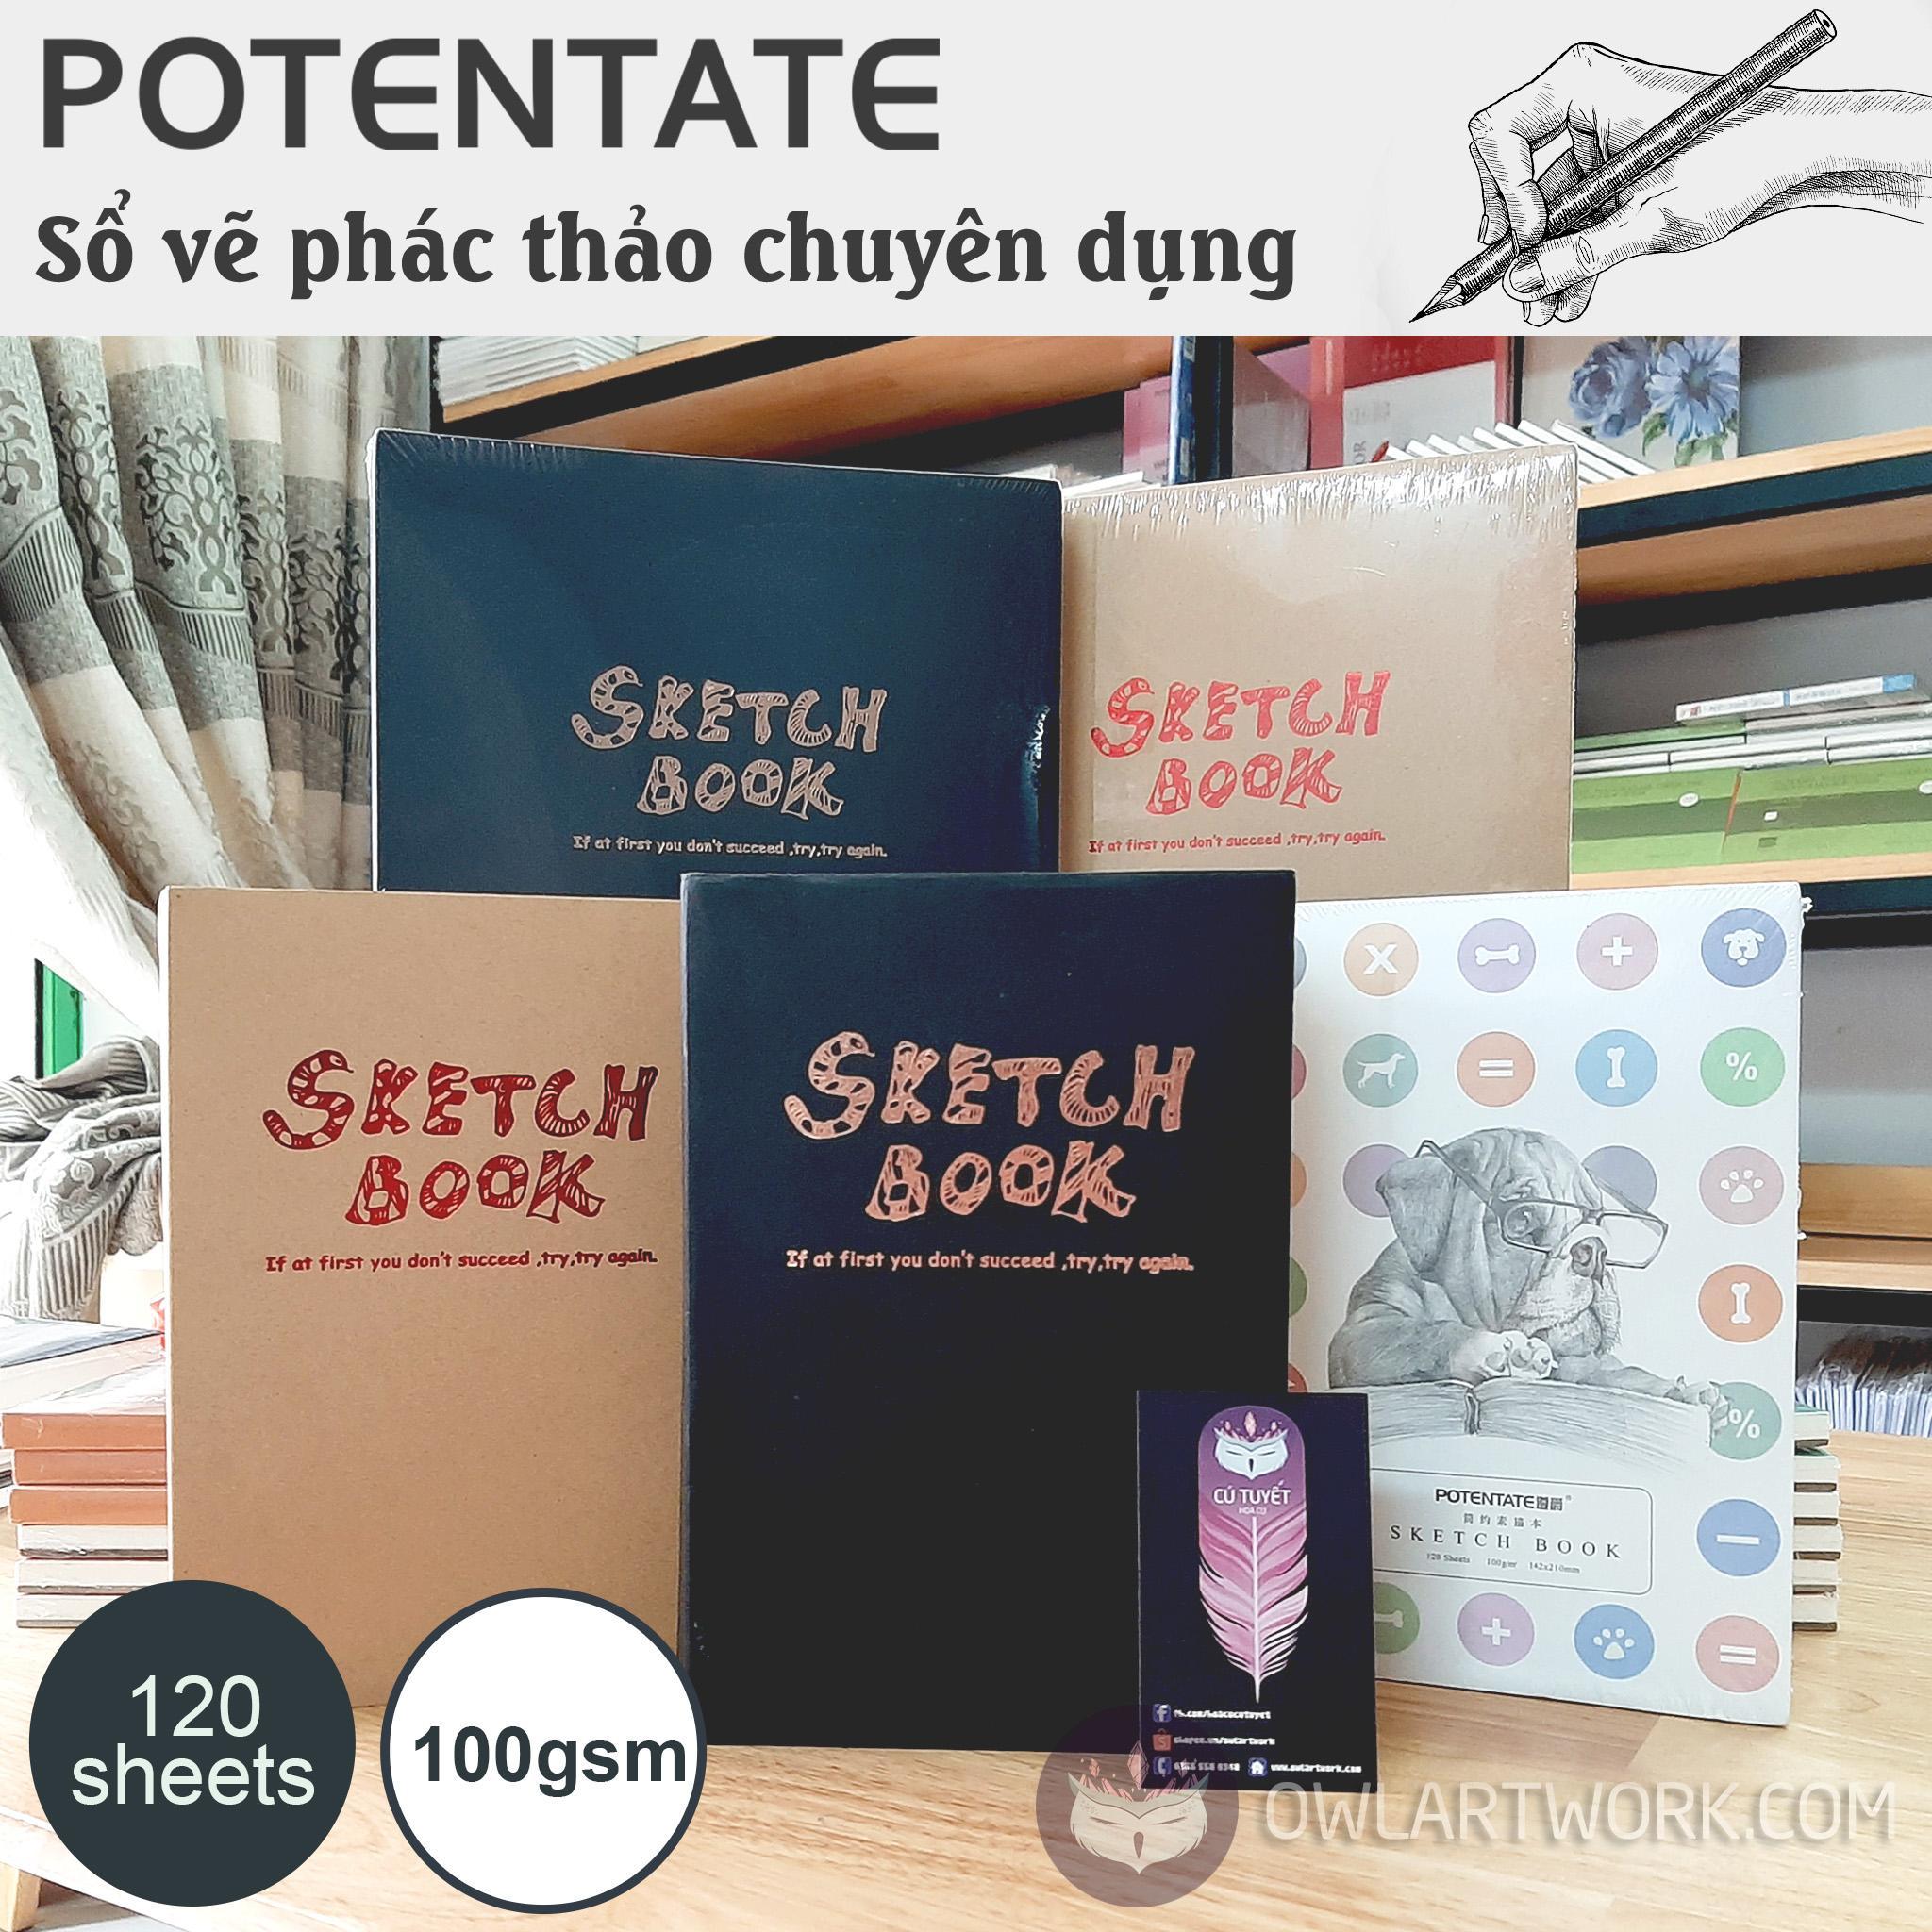 Mua Sổ Vẽ Phác Thảo Potentate A5 100gsm – Sketchbook